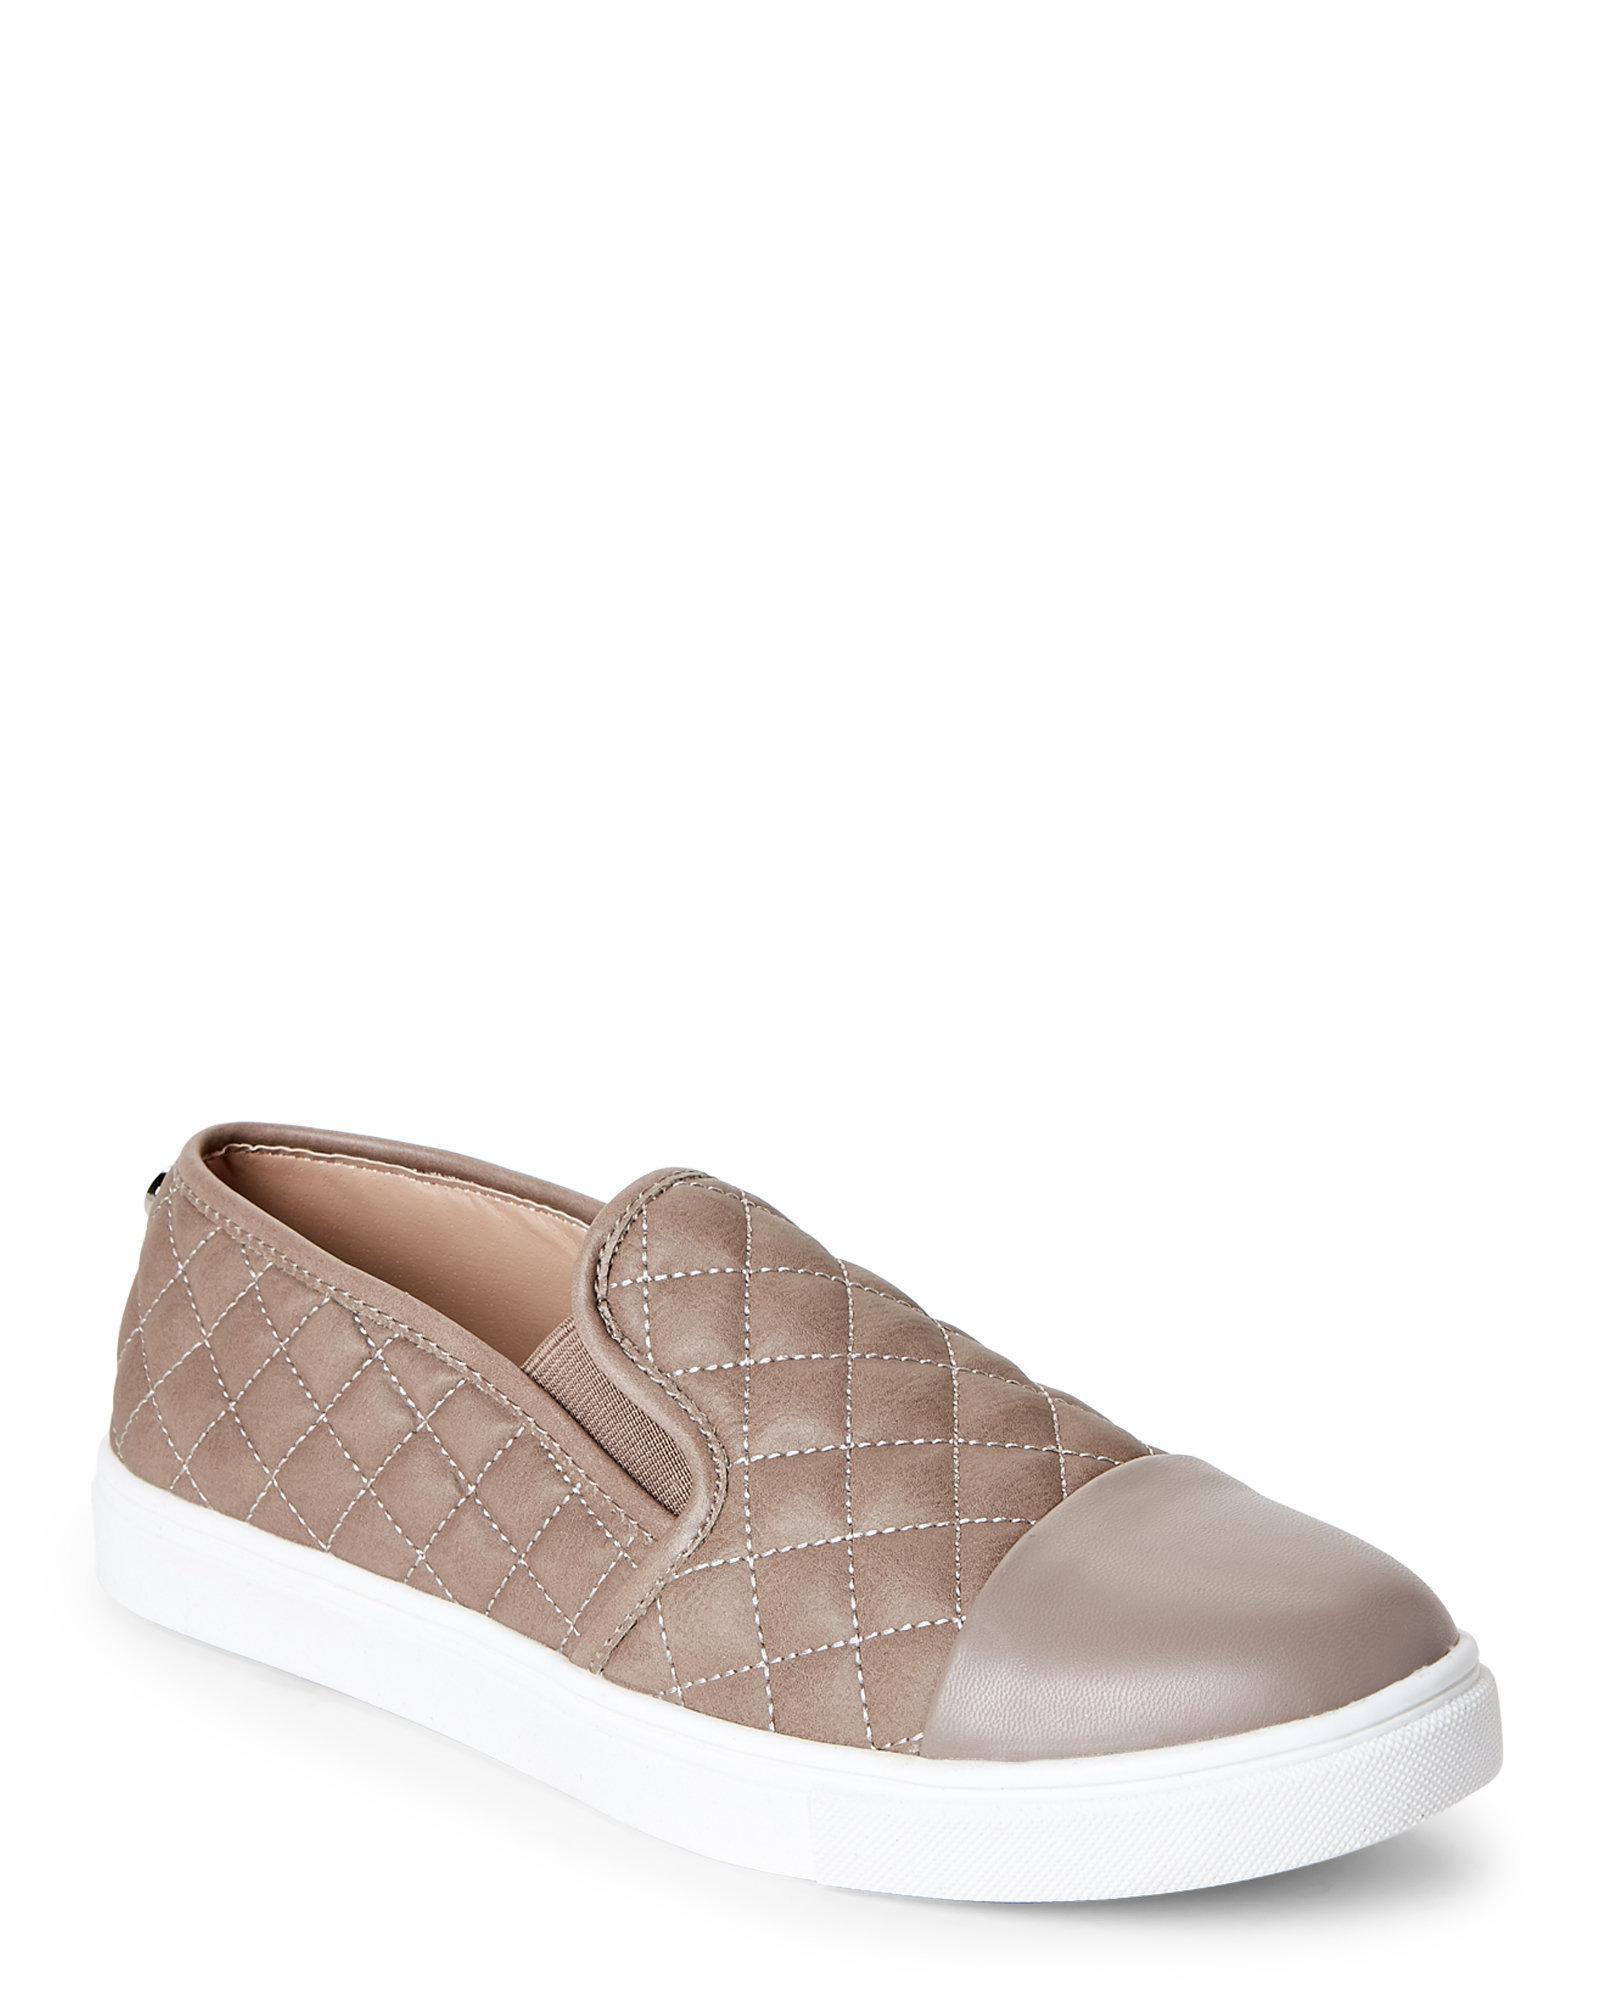 6e930bb73de99e Lyst - Steve Madden Grey Zander Quilted Slip On Sneakers in Gray